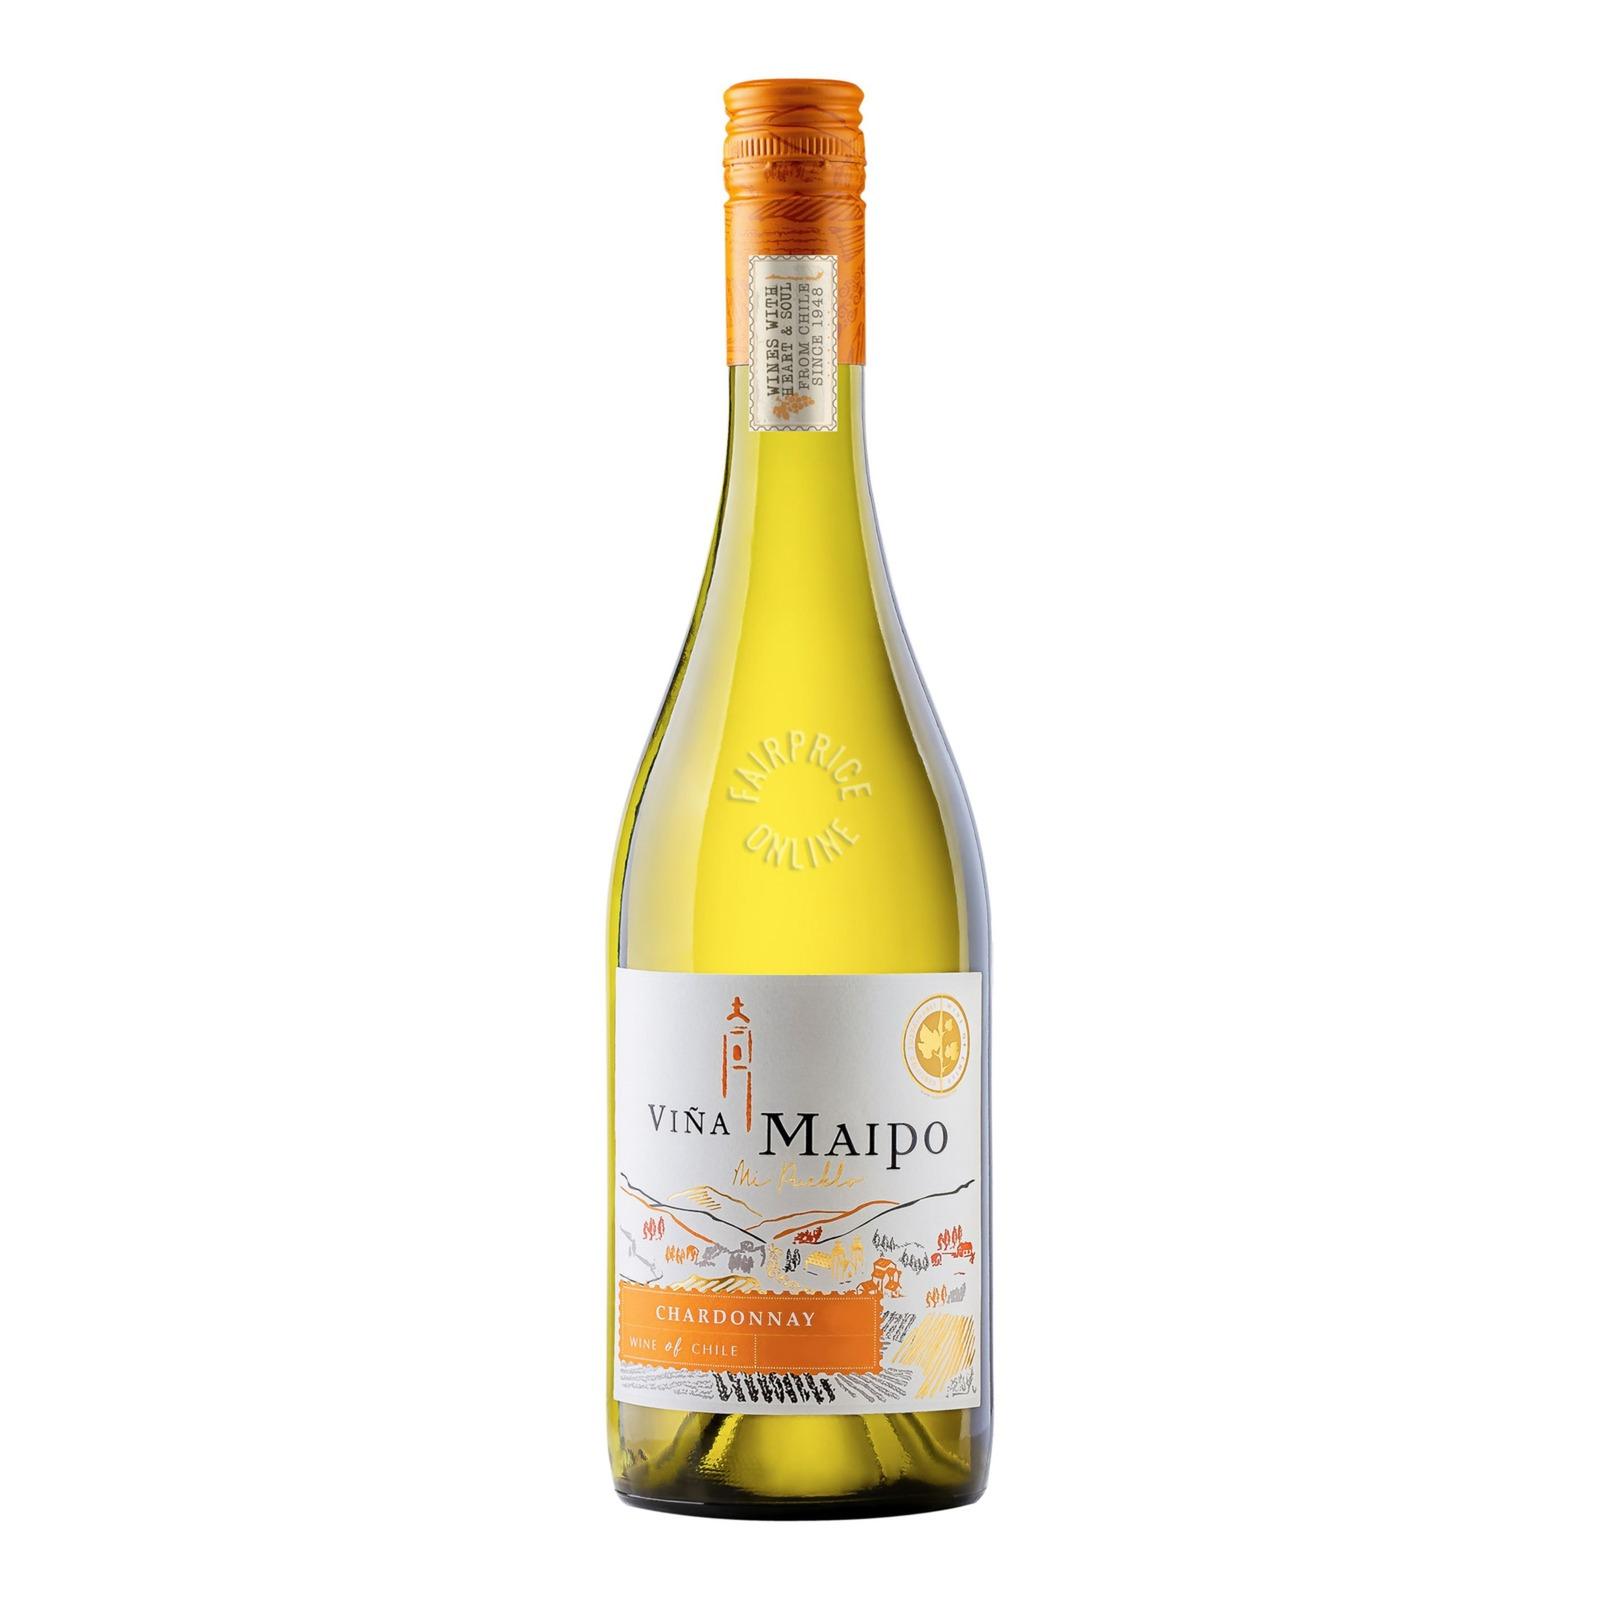 Vina Maipo White Wine - Chardonnay